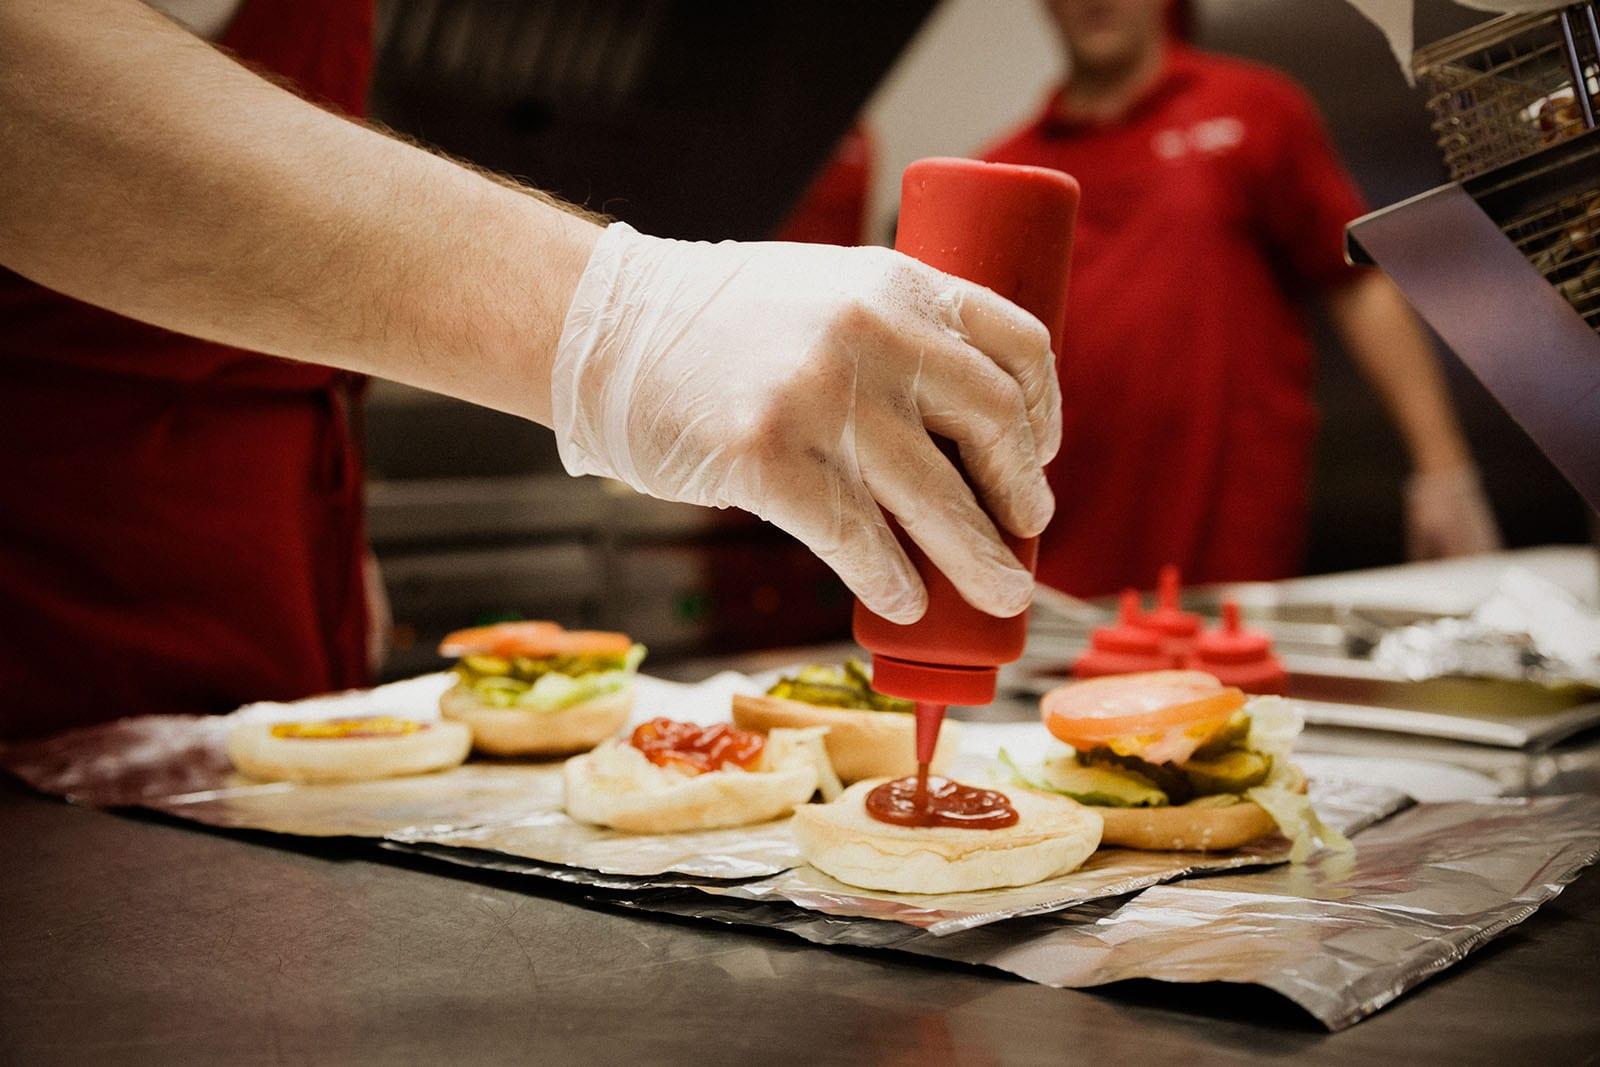 5 Guys Burger and Fries New York 04